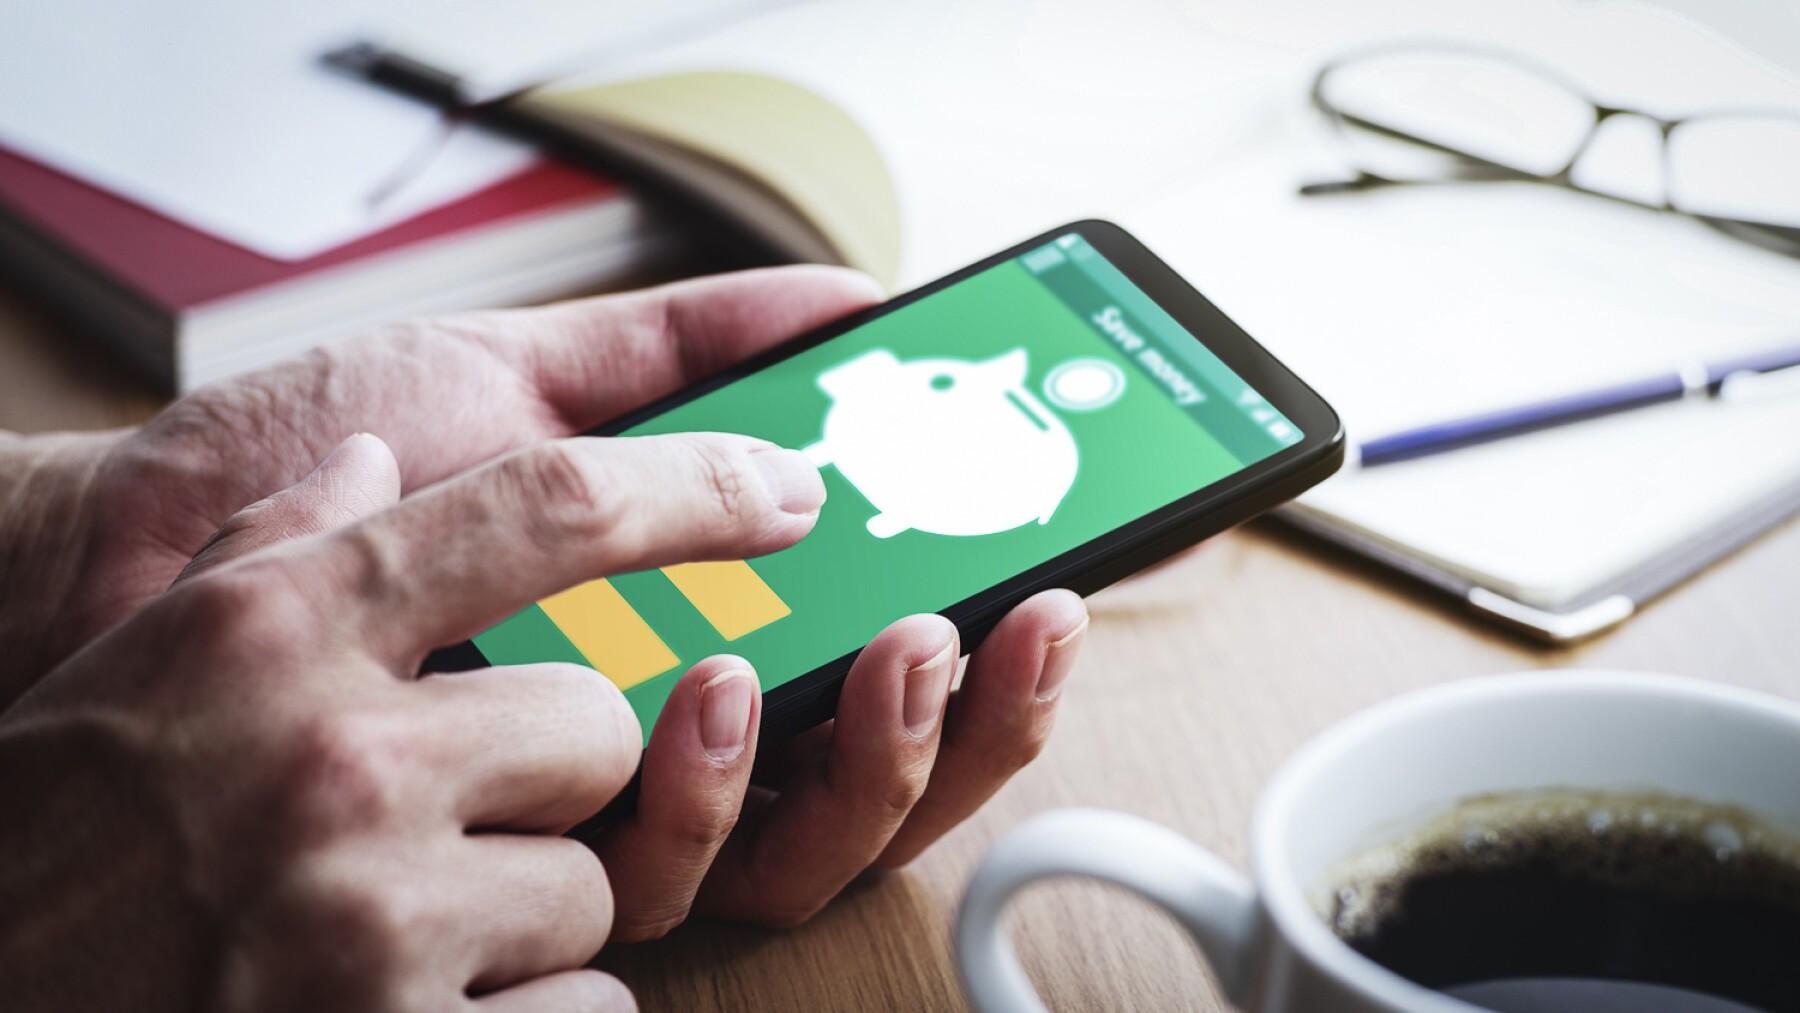 Piggy bank icon on smartphone screen.